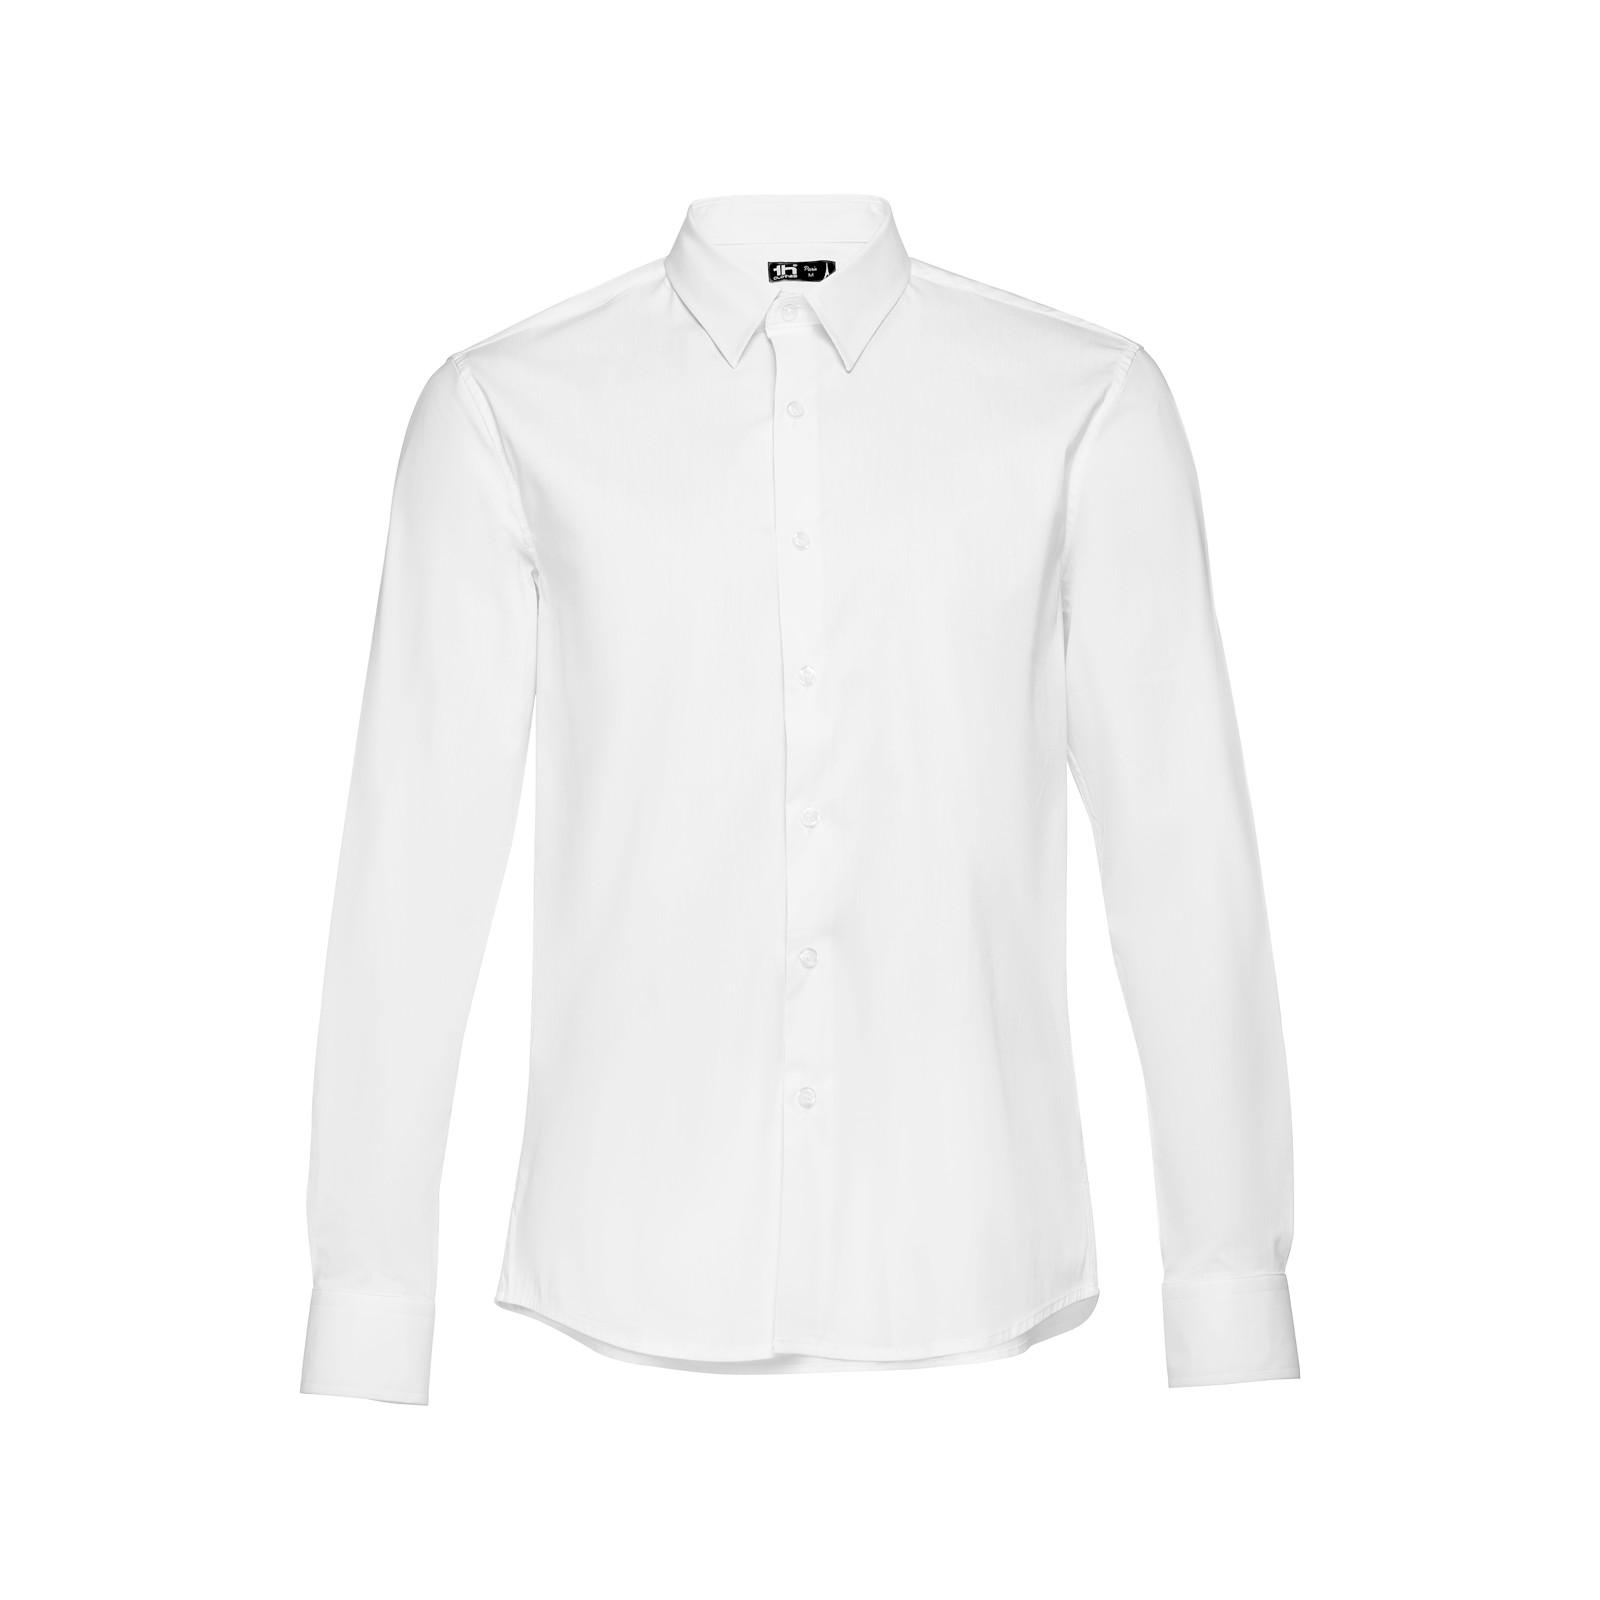 THC PARIS WH. Pánská popelínová košile - Bílá / S